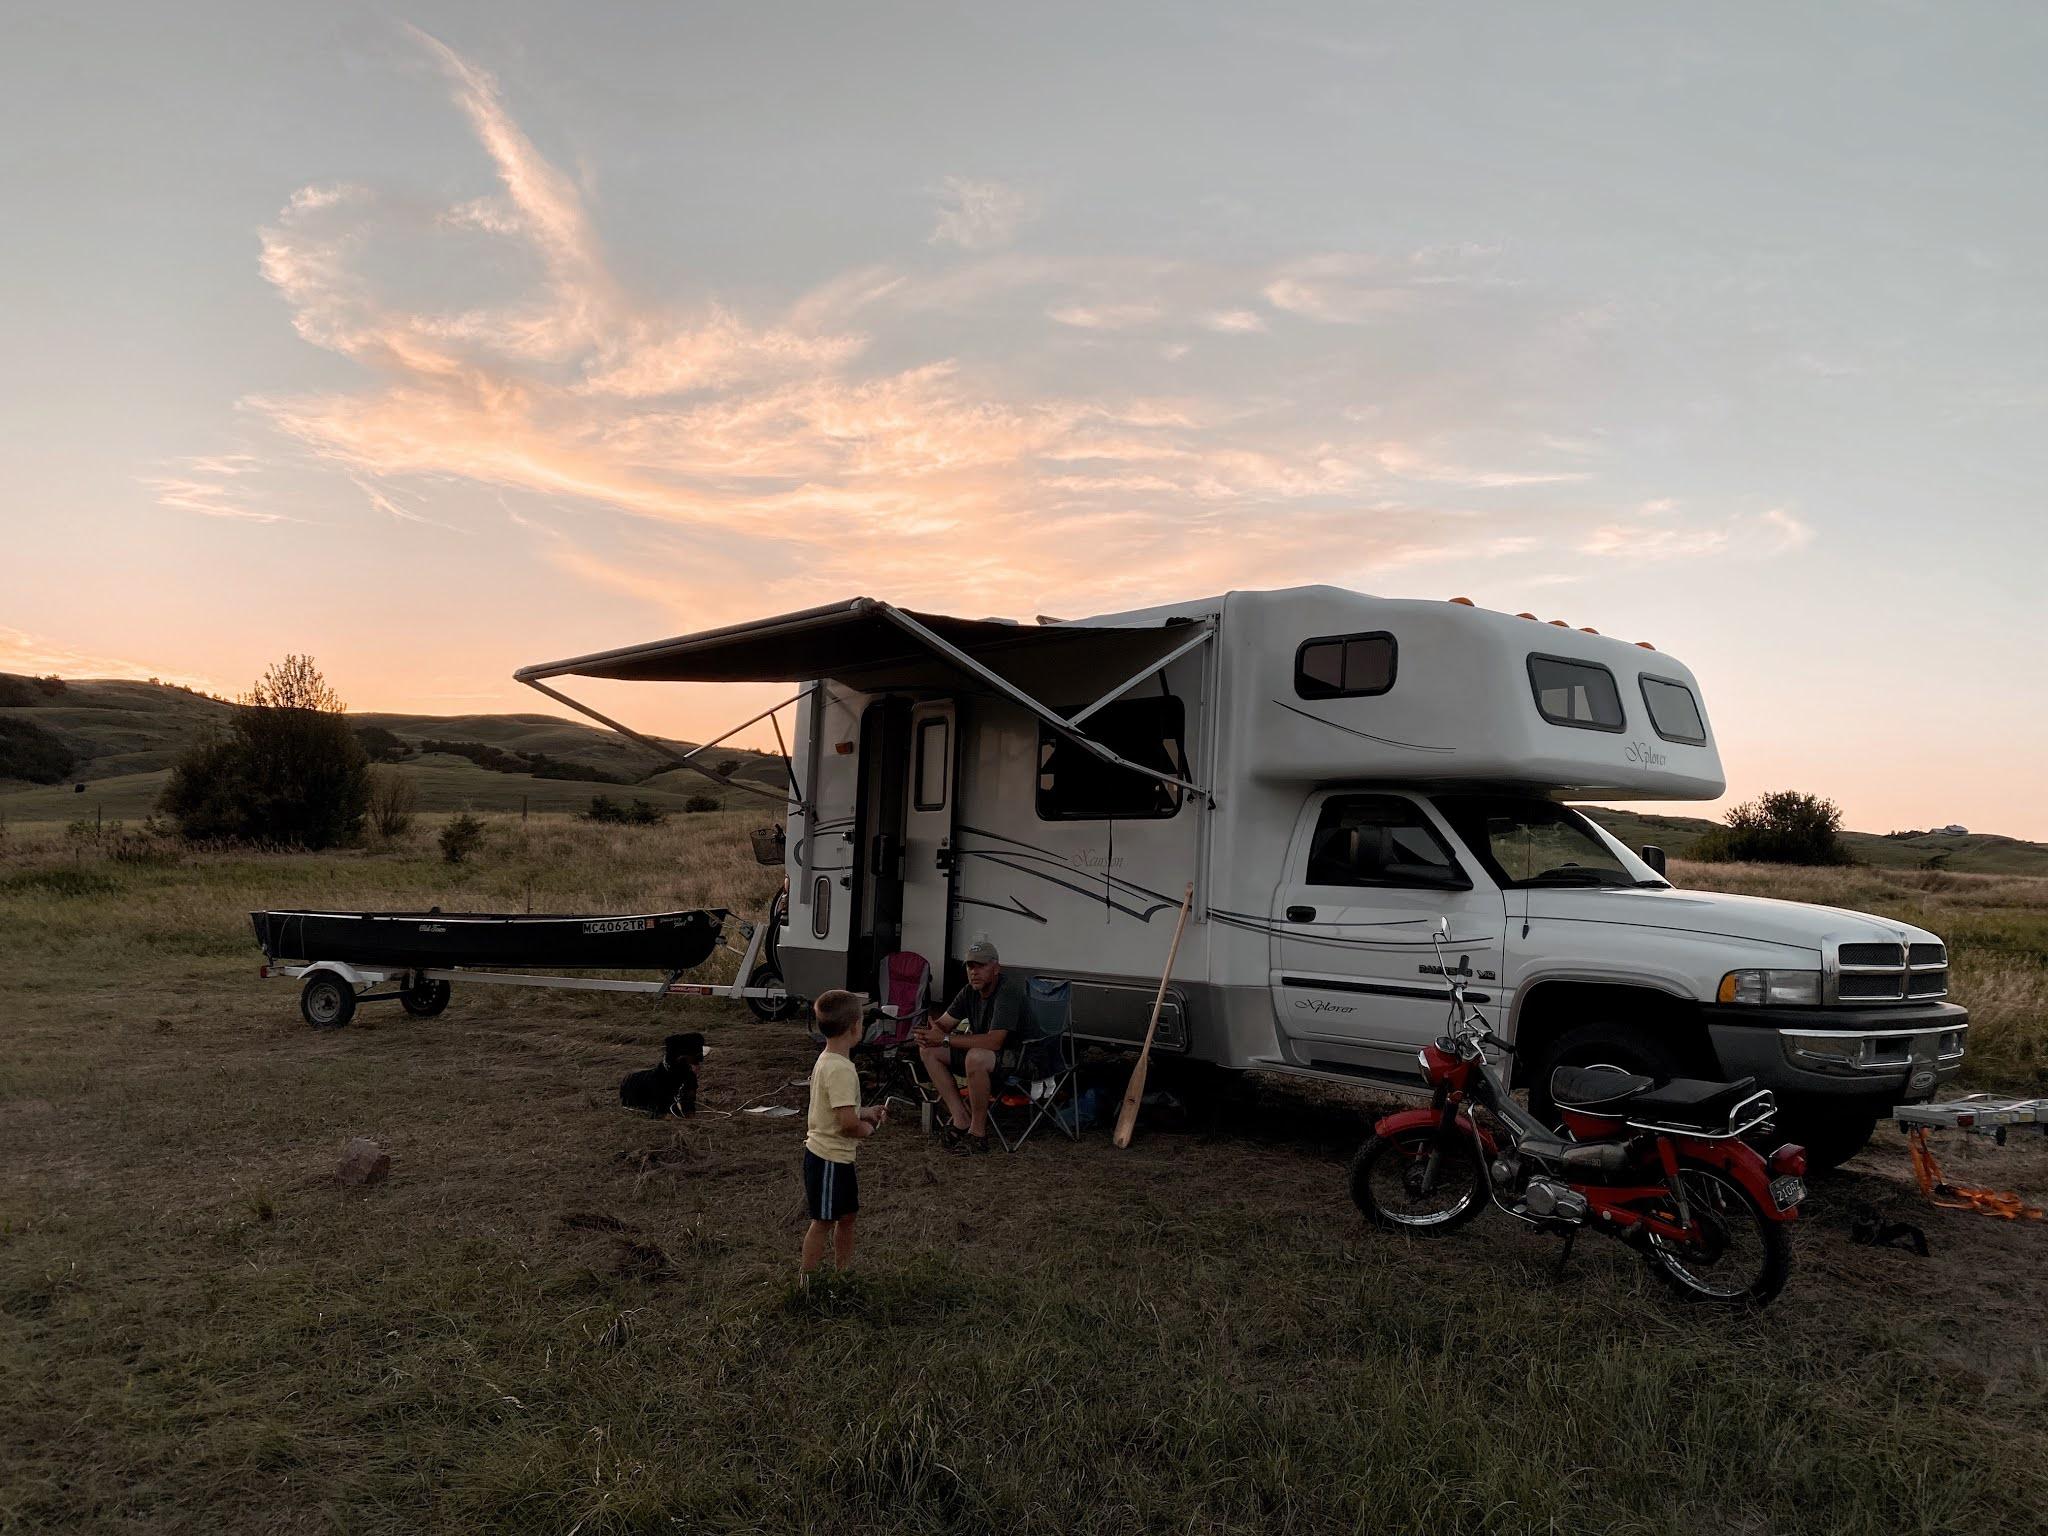 Campsite on the Missouri River, South Dakota| biblio-style.com